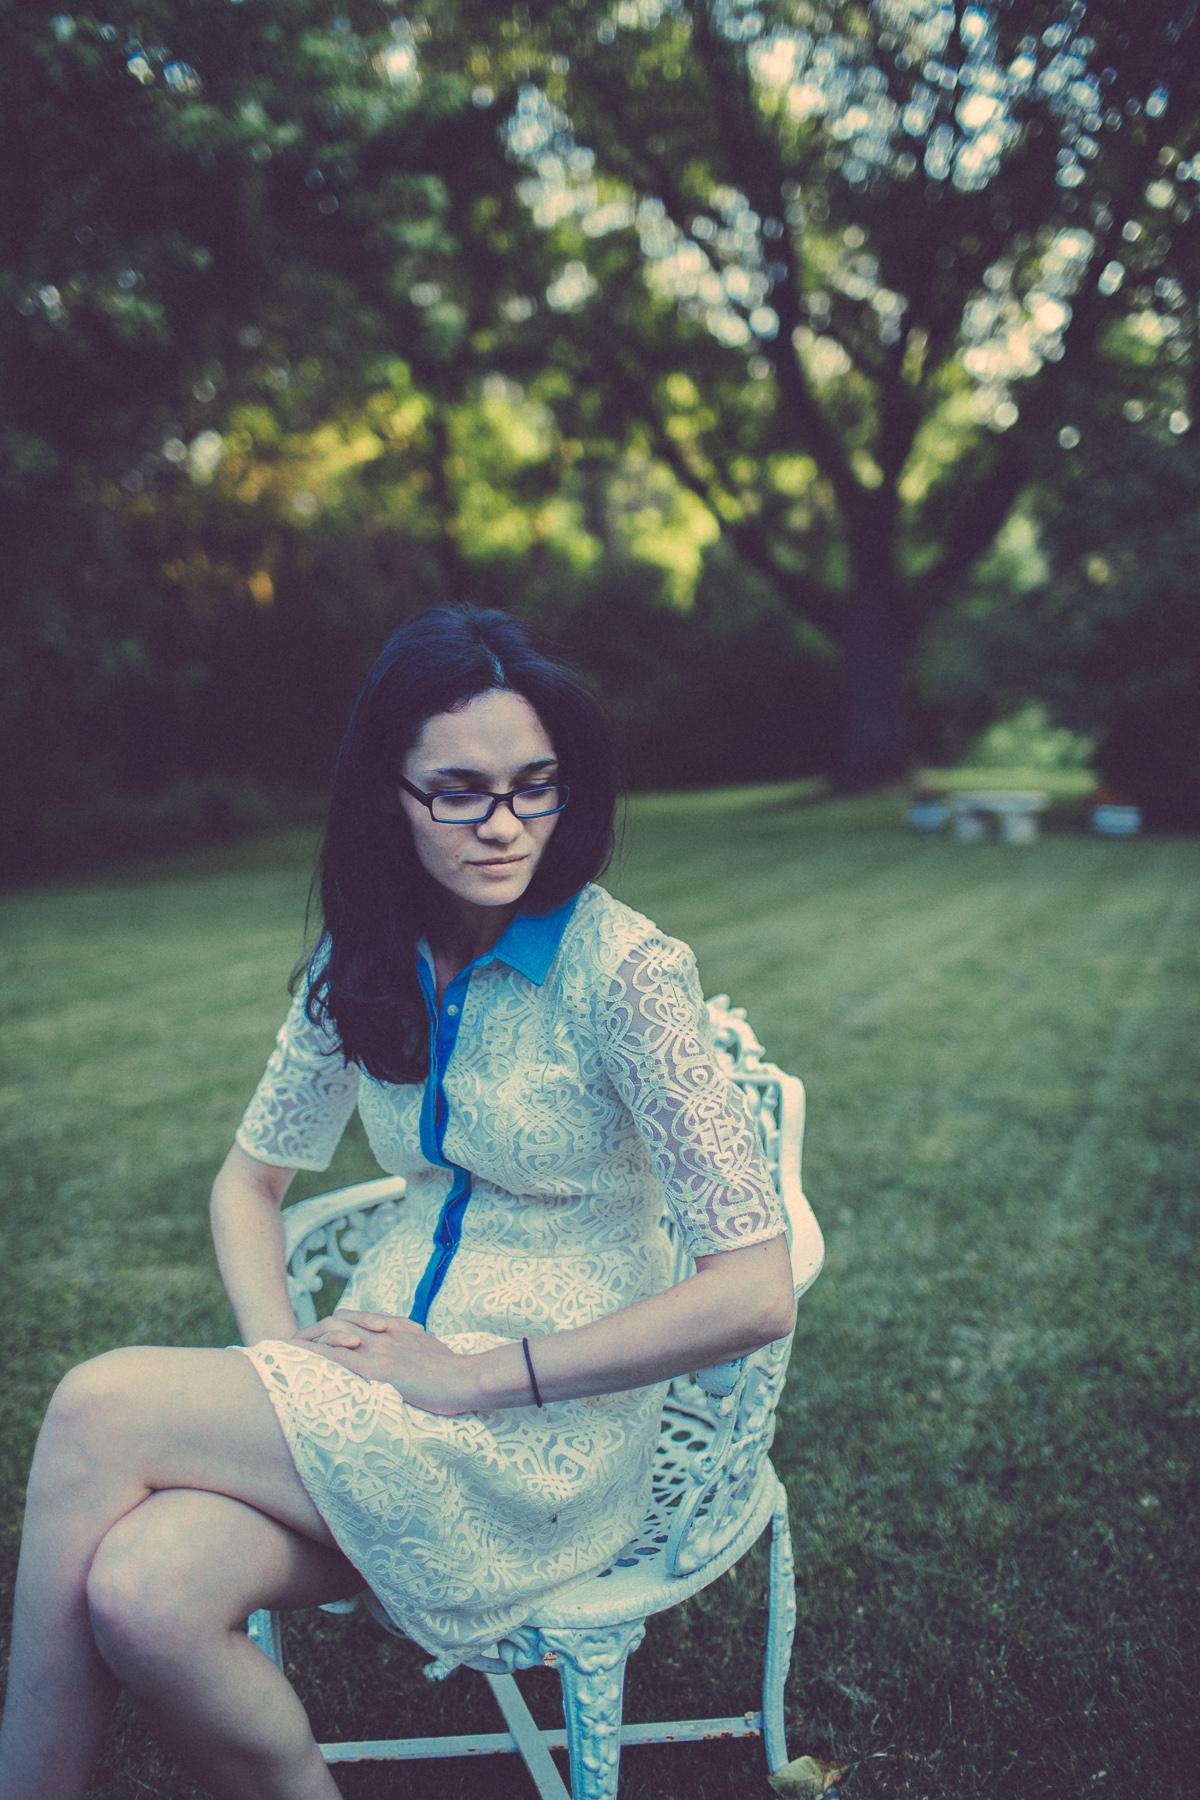 Lydia_Nihart_At_The_Outing_Lodge_Stillwater_Minnesota_By_Photographer_Joe_Lemke_008.JPG